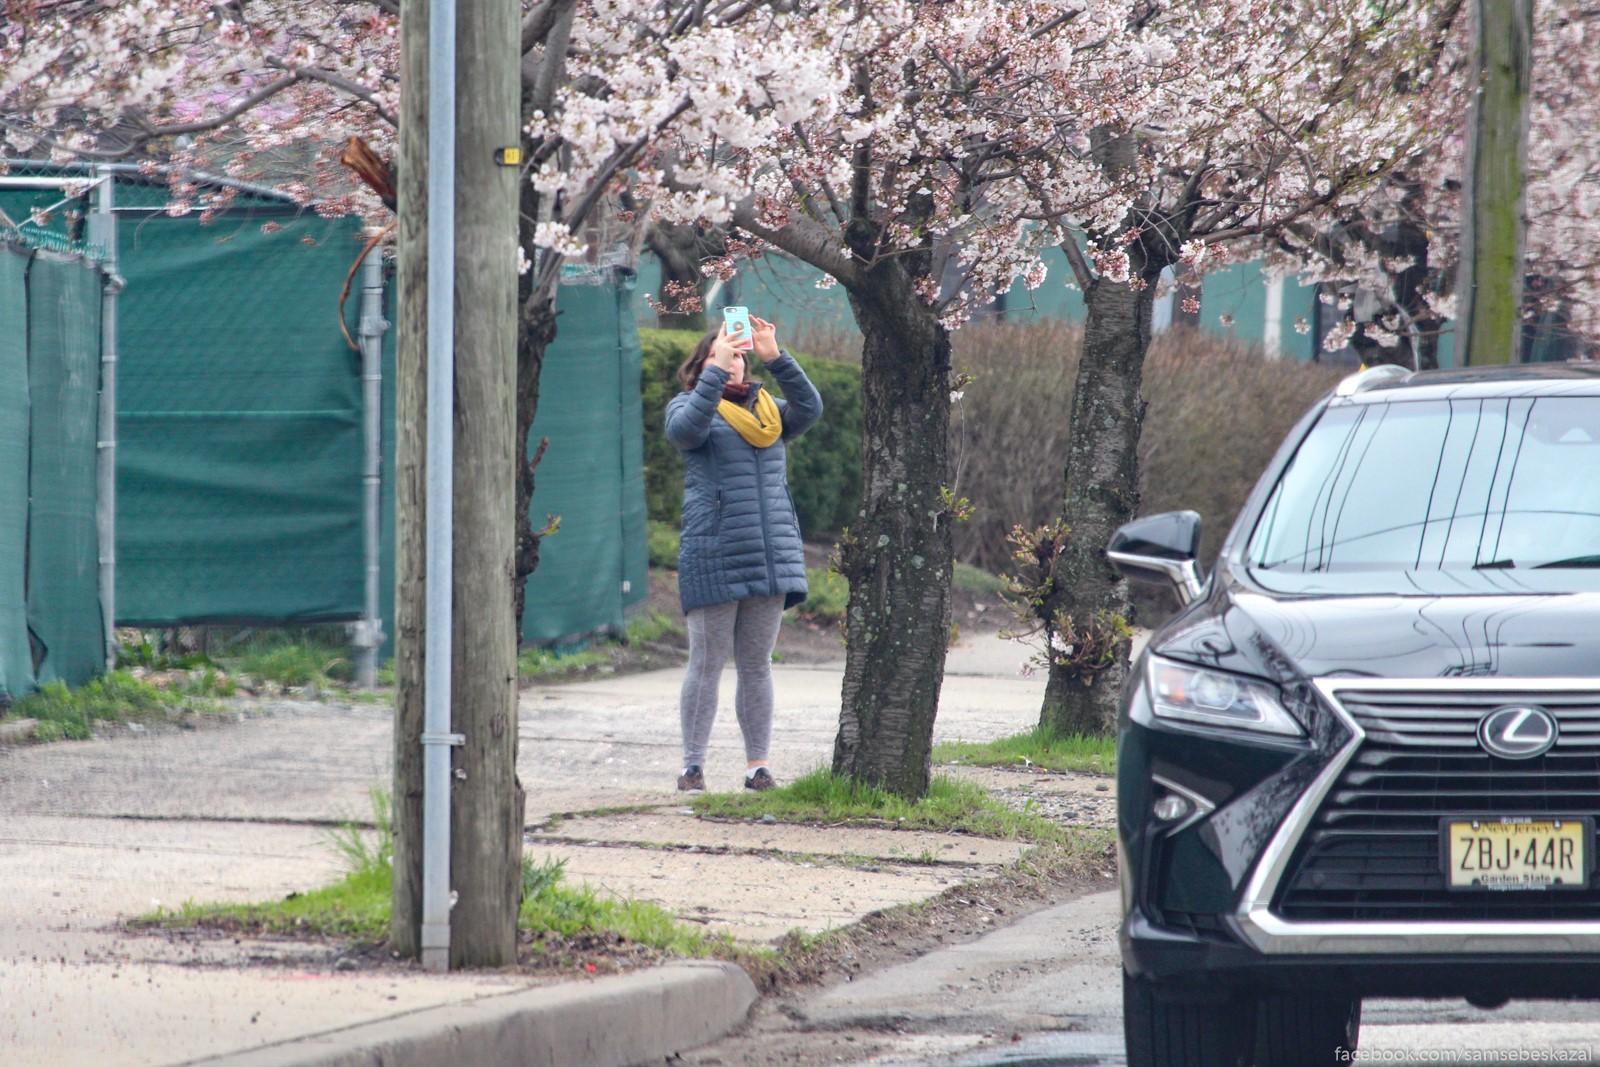 Нью-Йорк/Нью-Джерси, 30 марта Pervyj vstrecennyj mnoj...